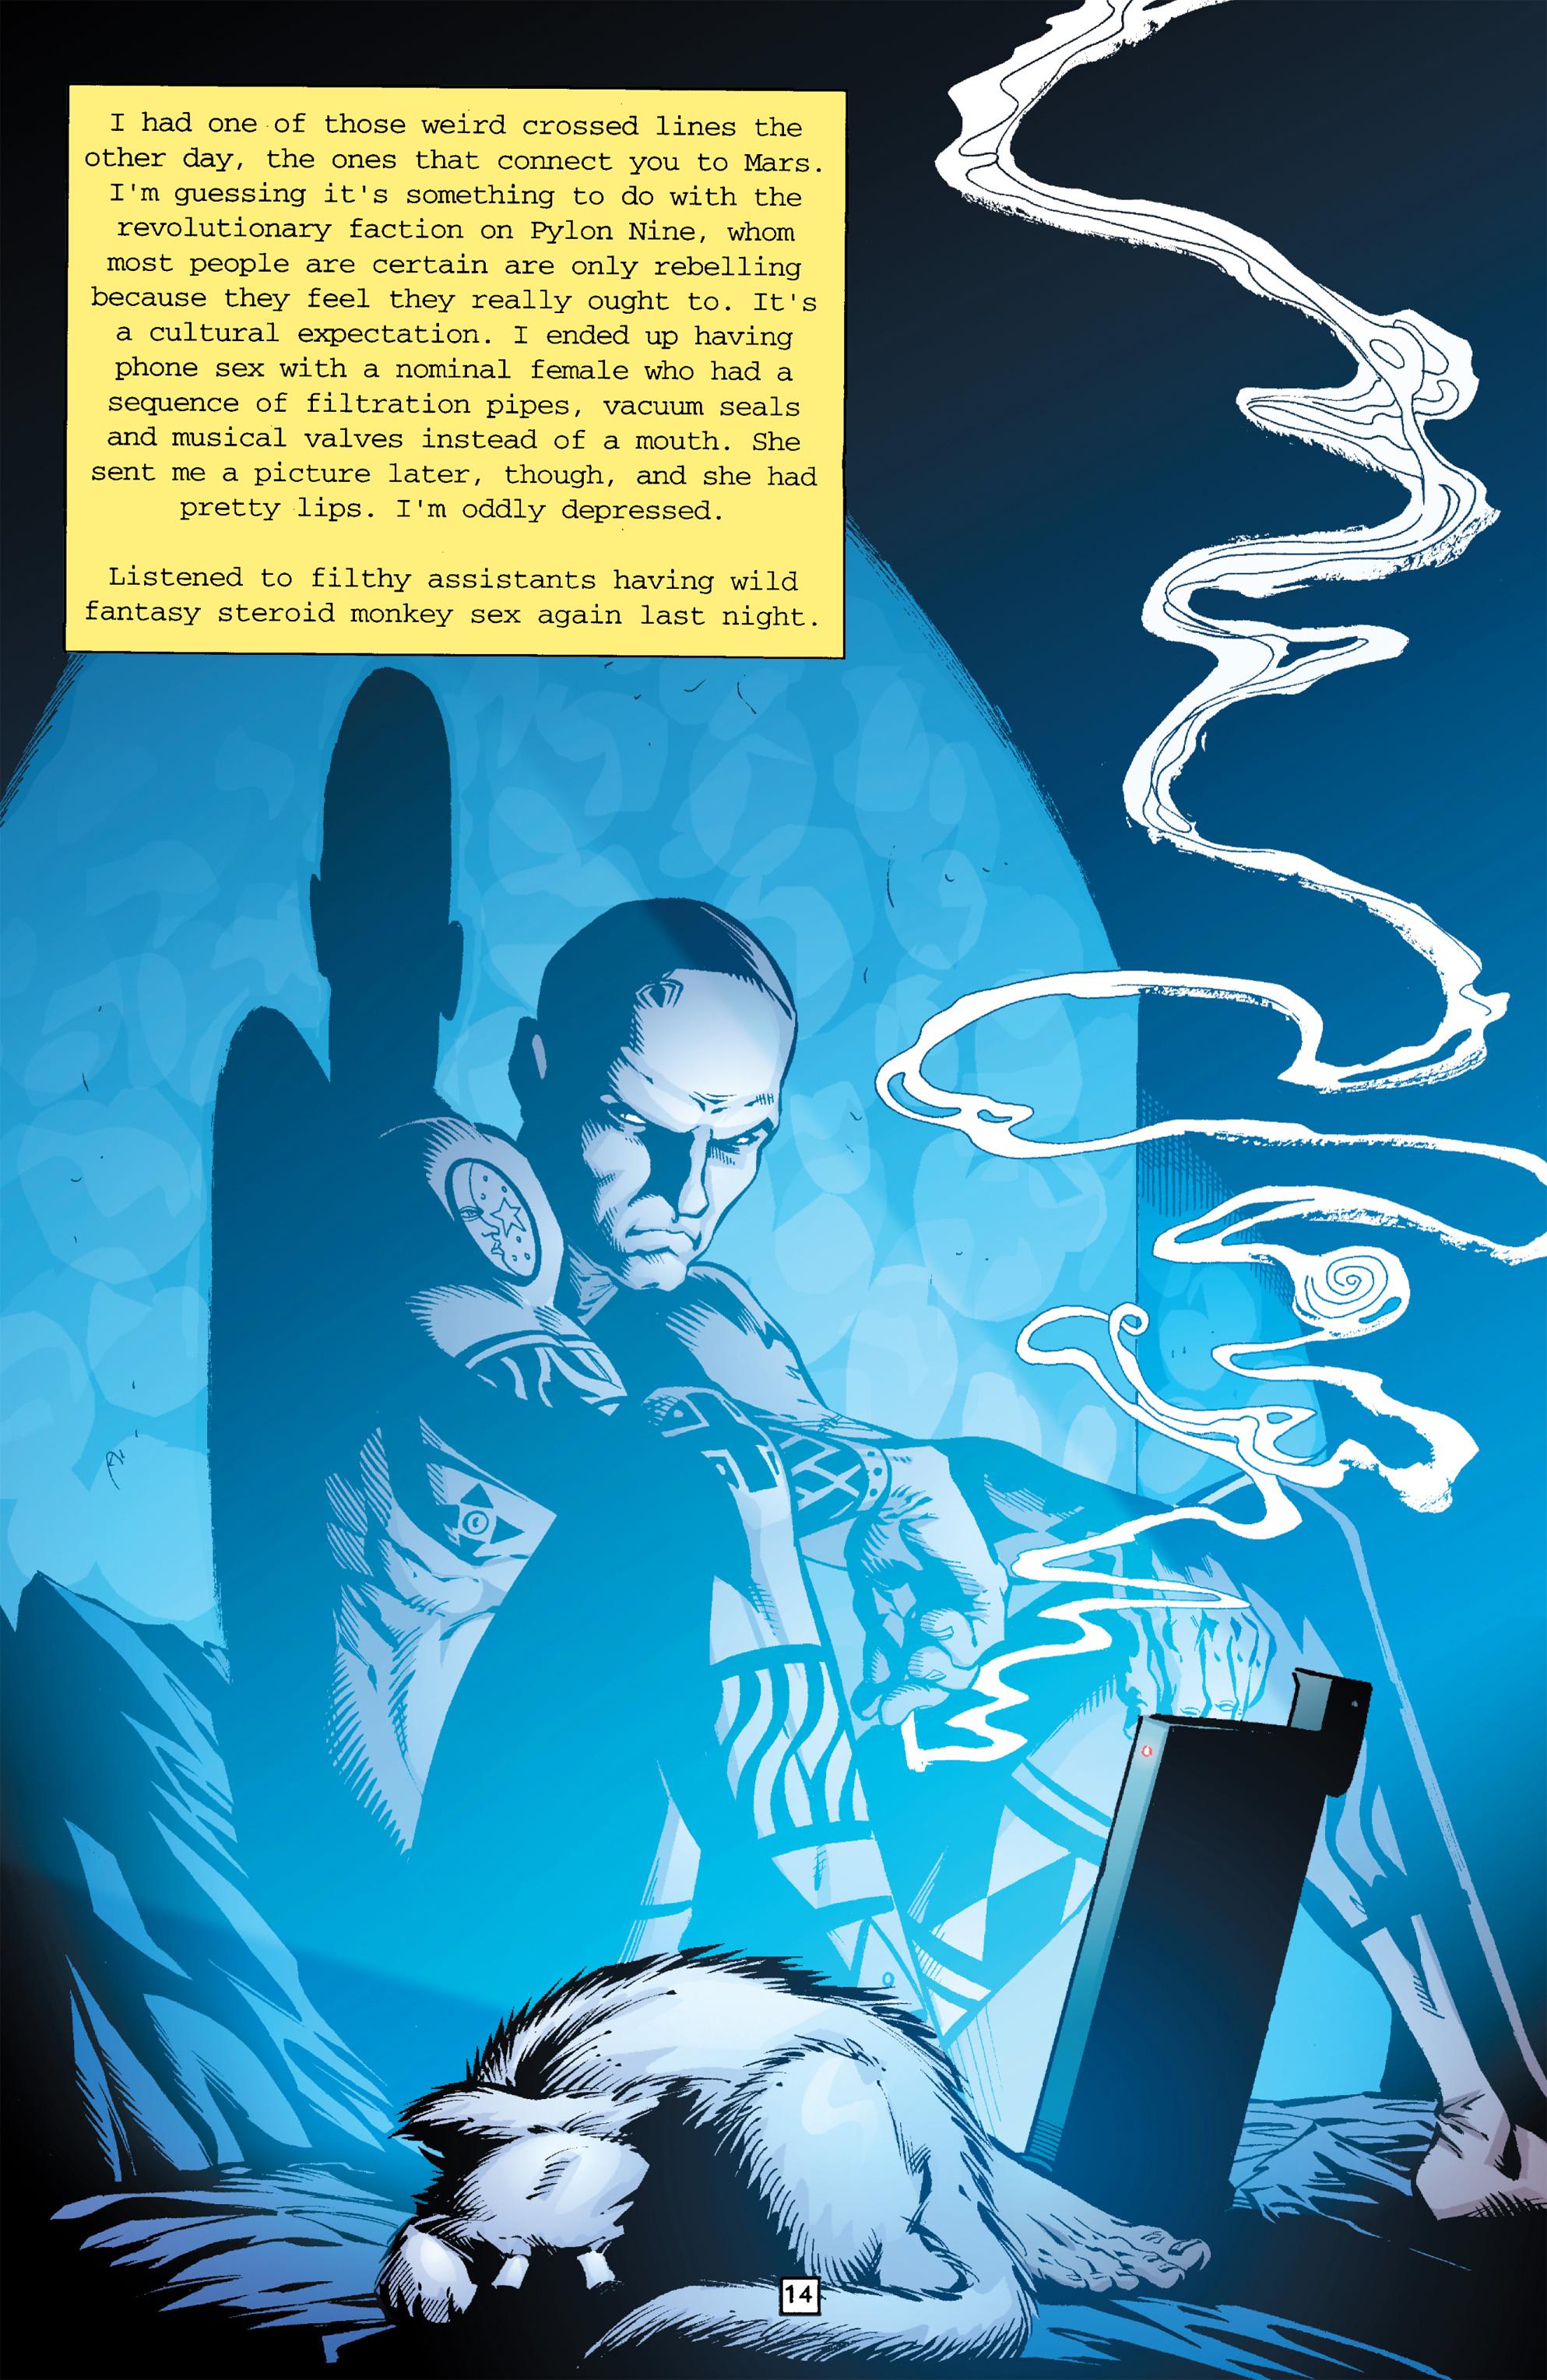 Read online Transmetropolitan comic -  Issue #26 - 15